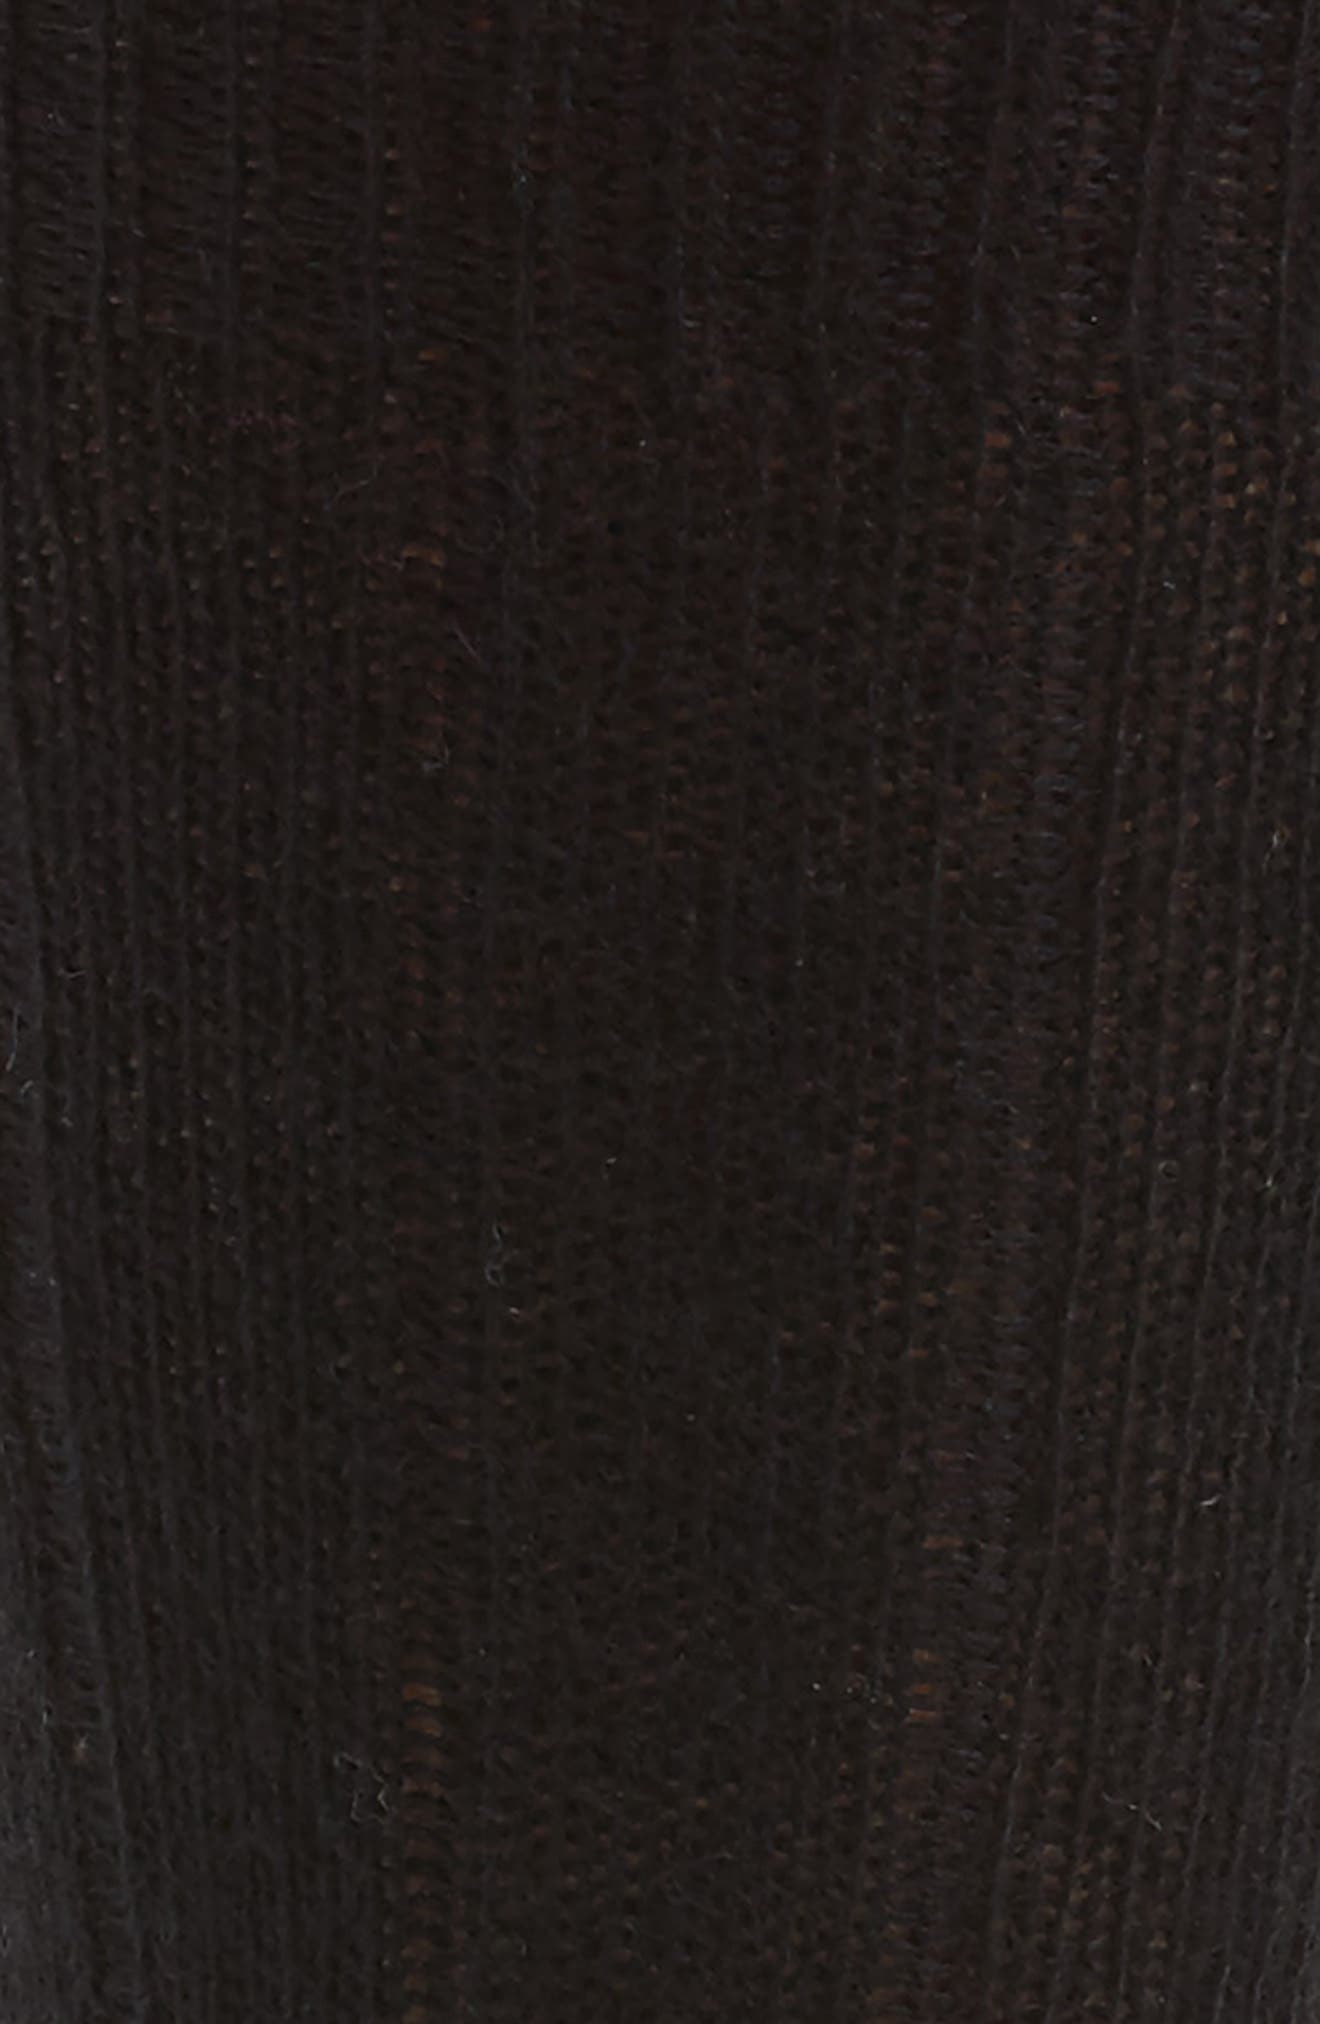 Cashmere Blend Socks,                             Alternate thumbnail 2, color,                             BLK